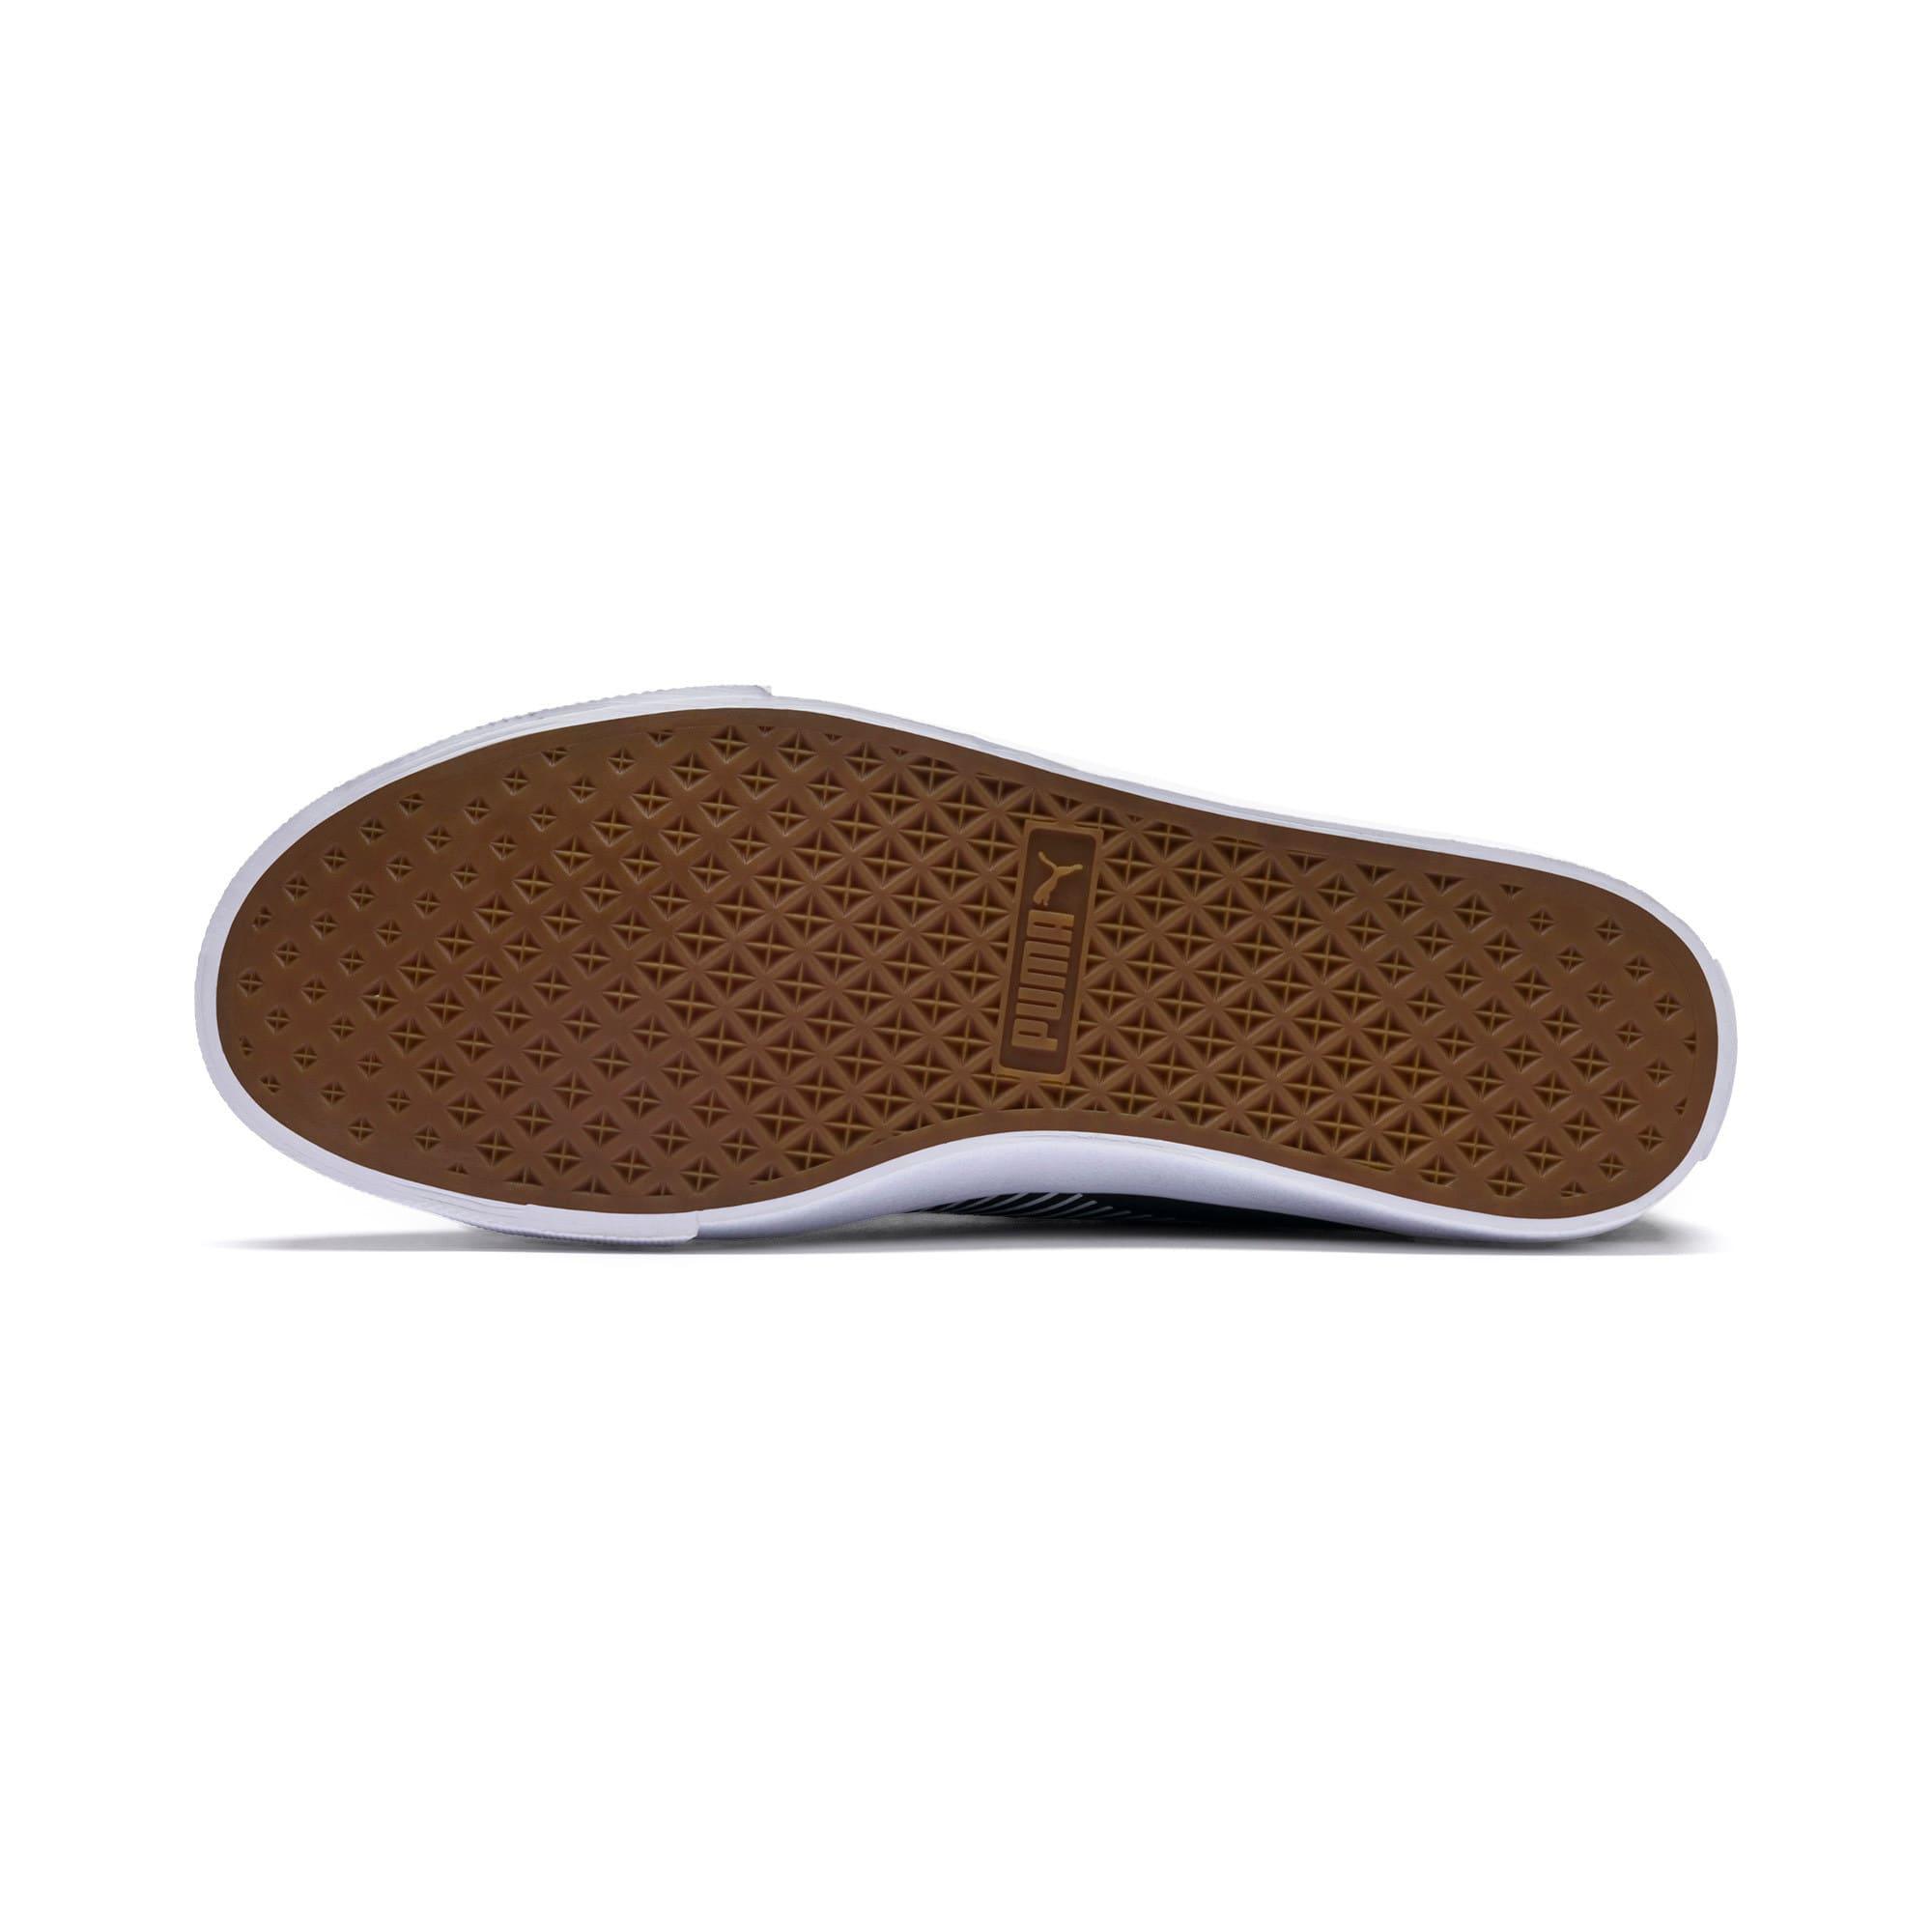 Thumbnail 3 of Bari Sneakers, Puma Black-Puma White, medium